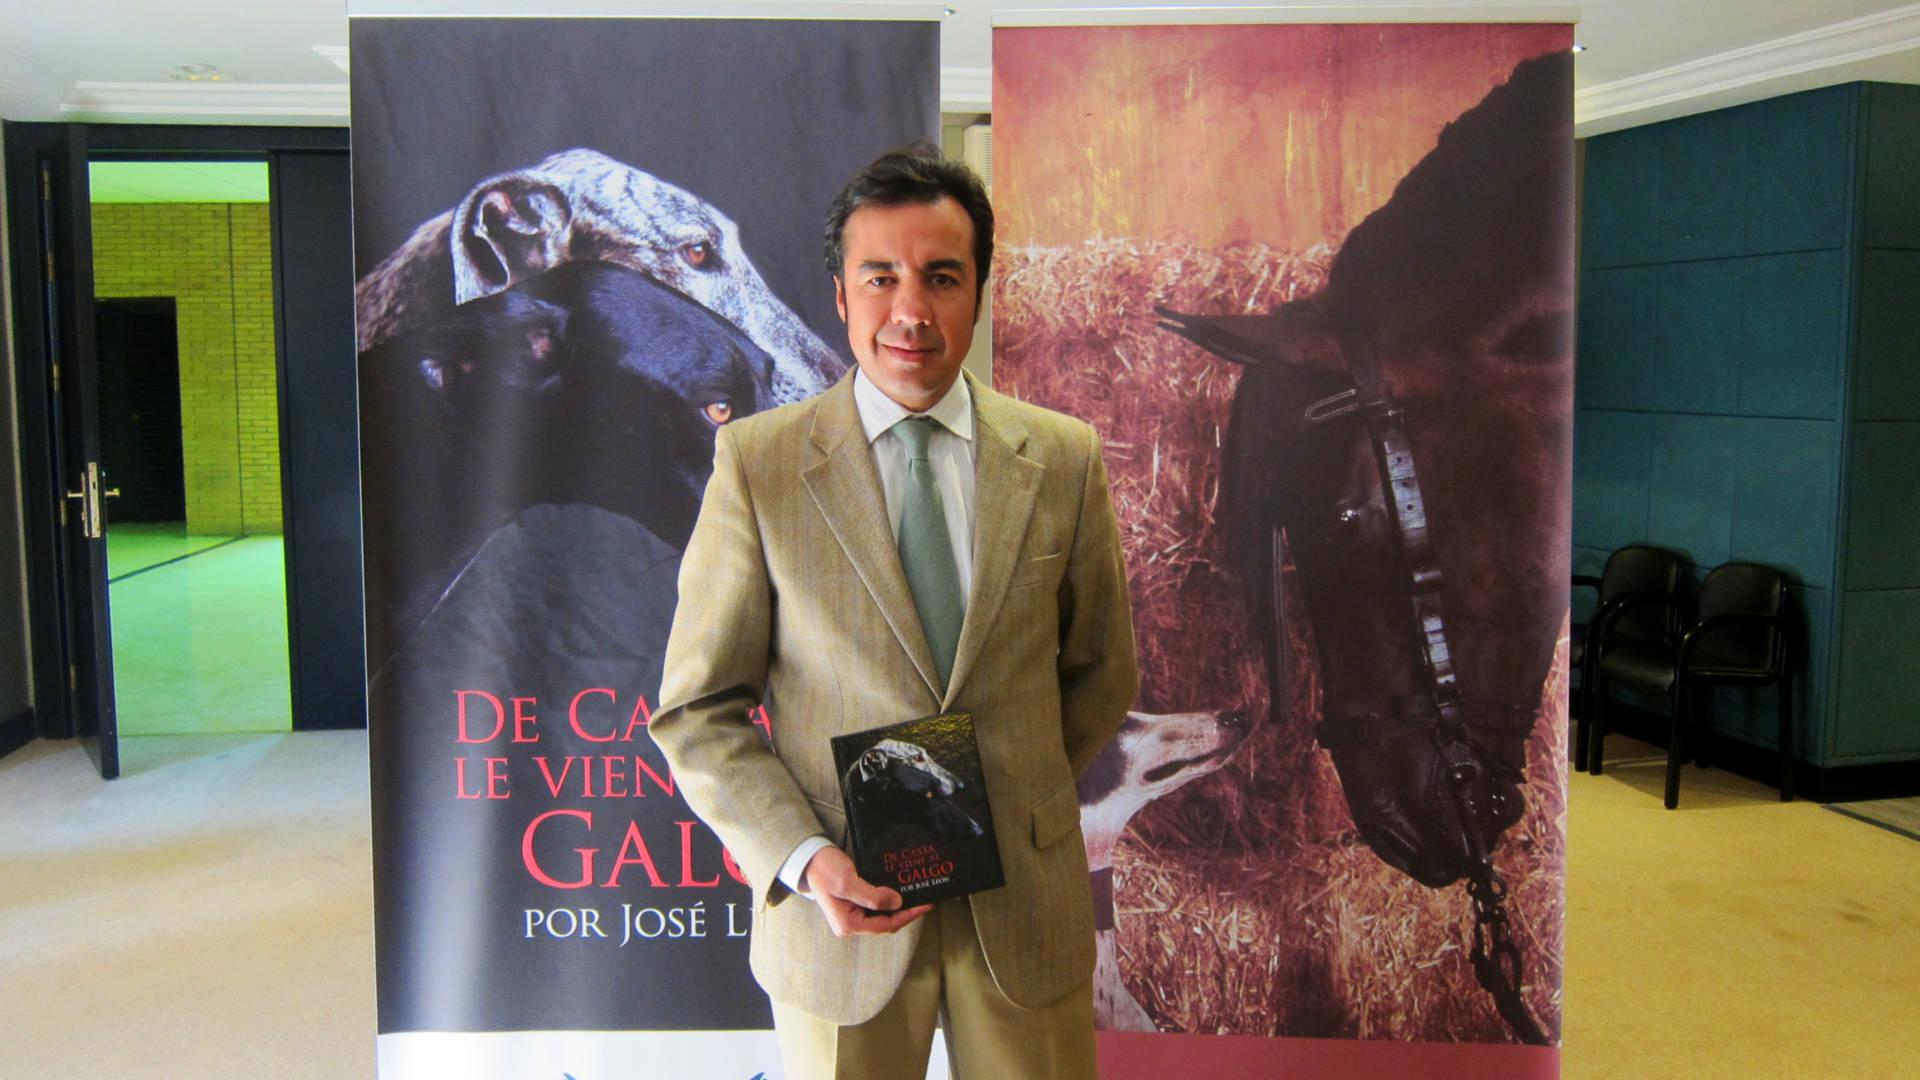 Nace 'De casta le viene al galgo', obra musical dedicada a este animal de José León